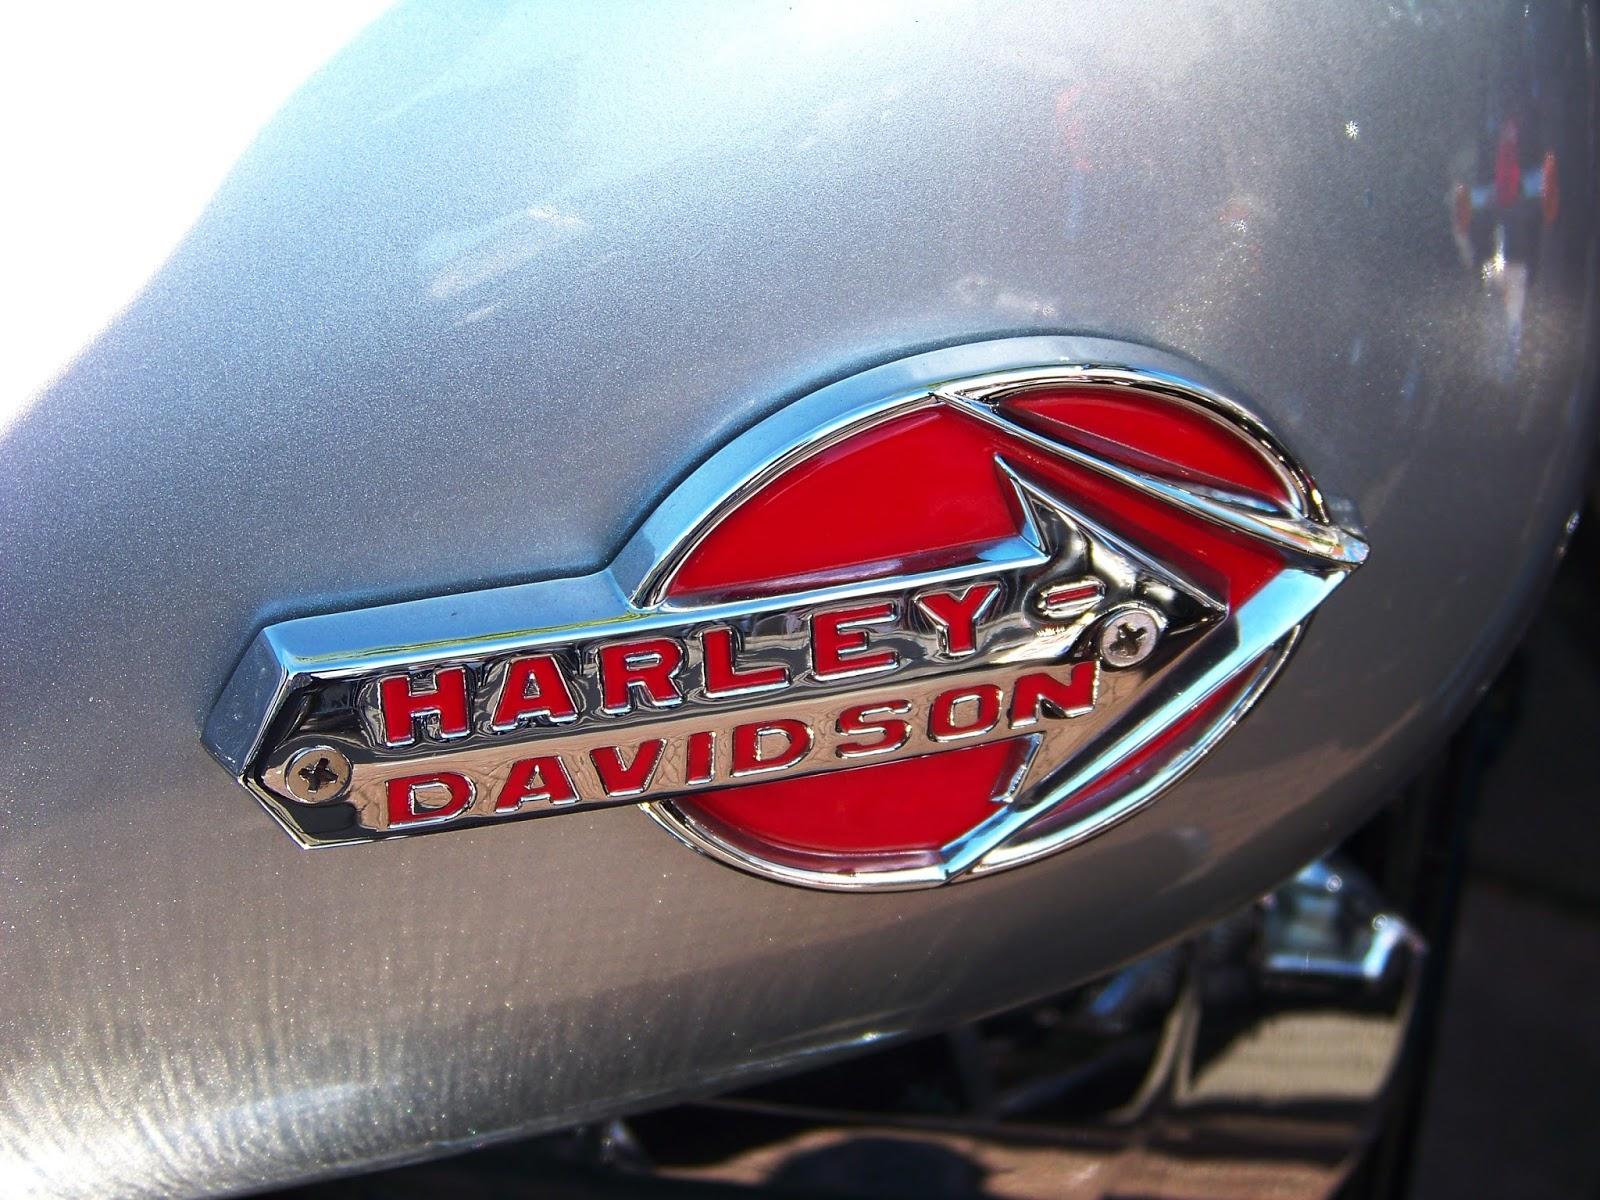 Harley Davidson tank logo's